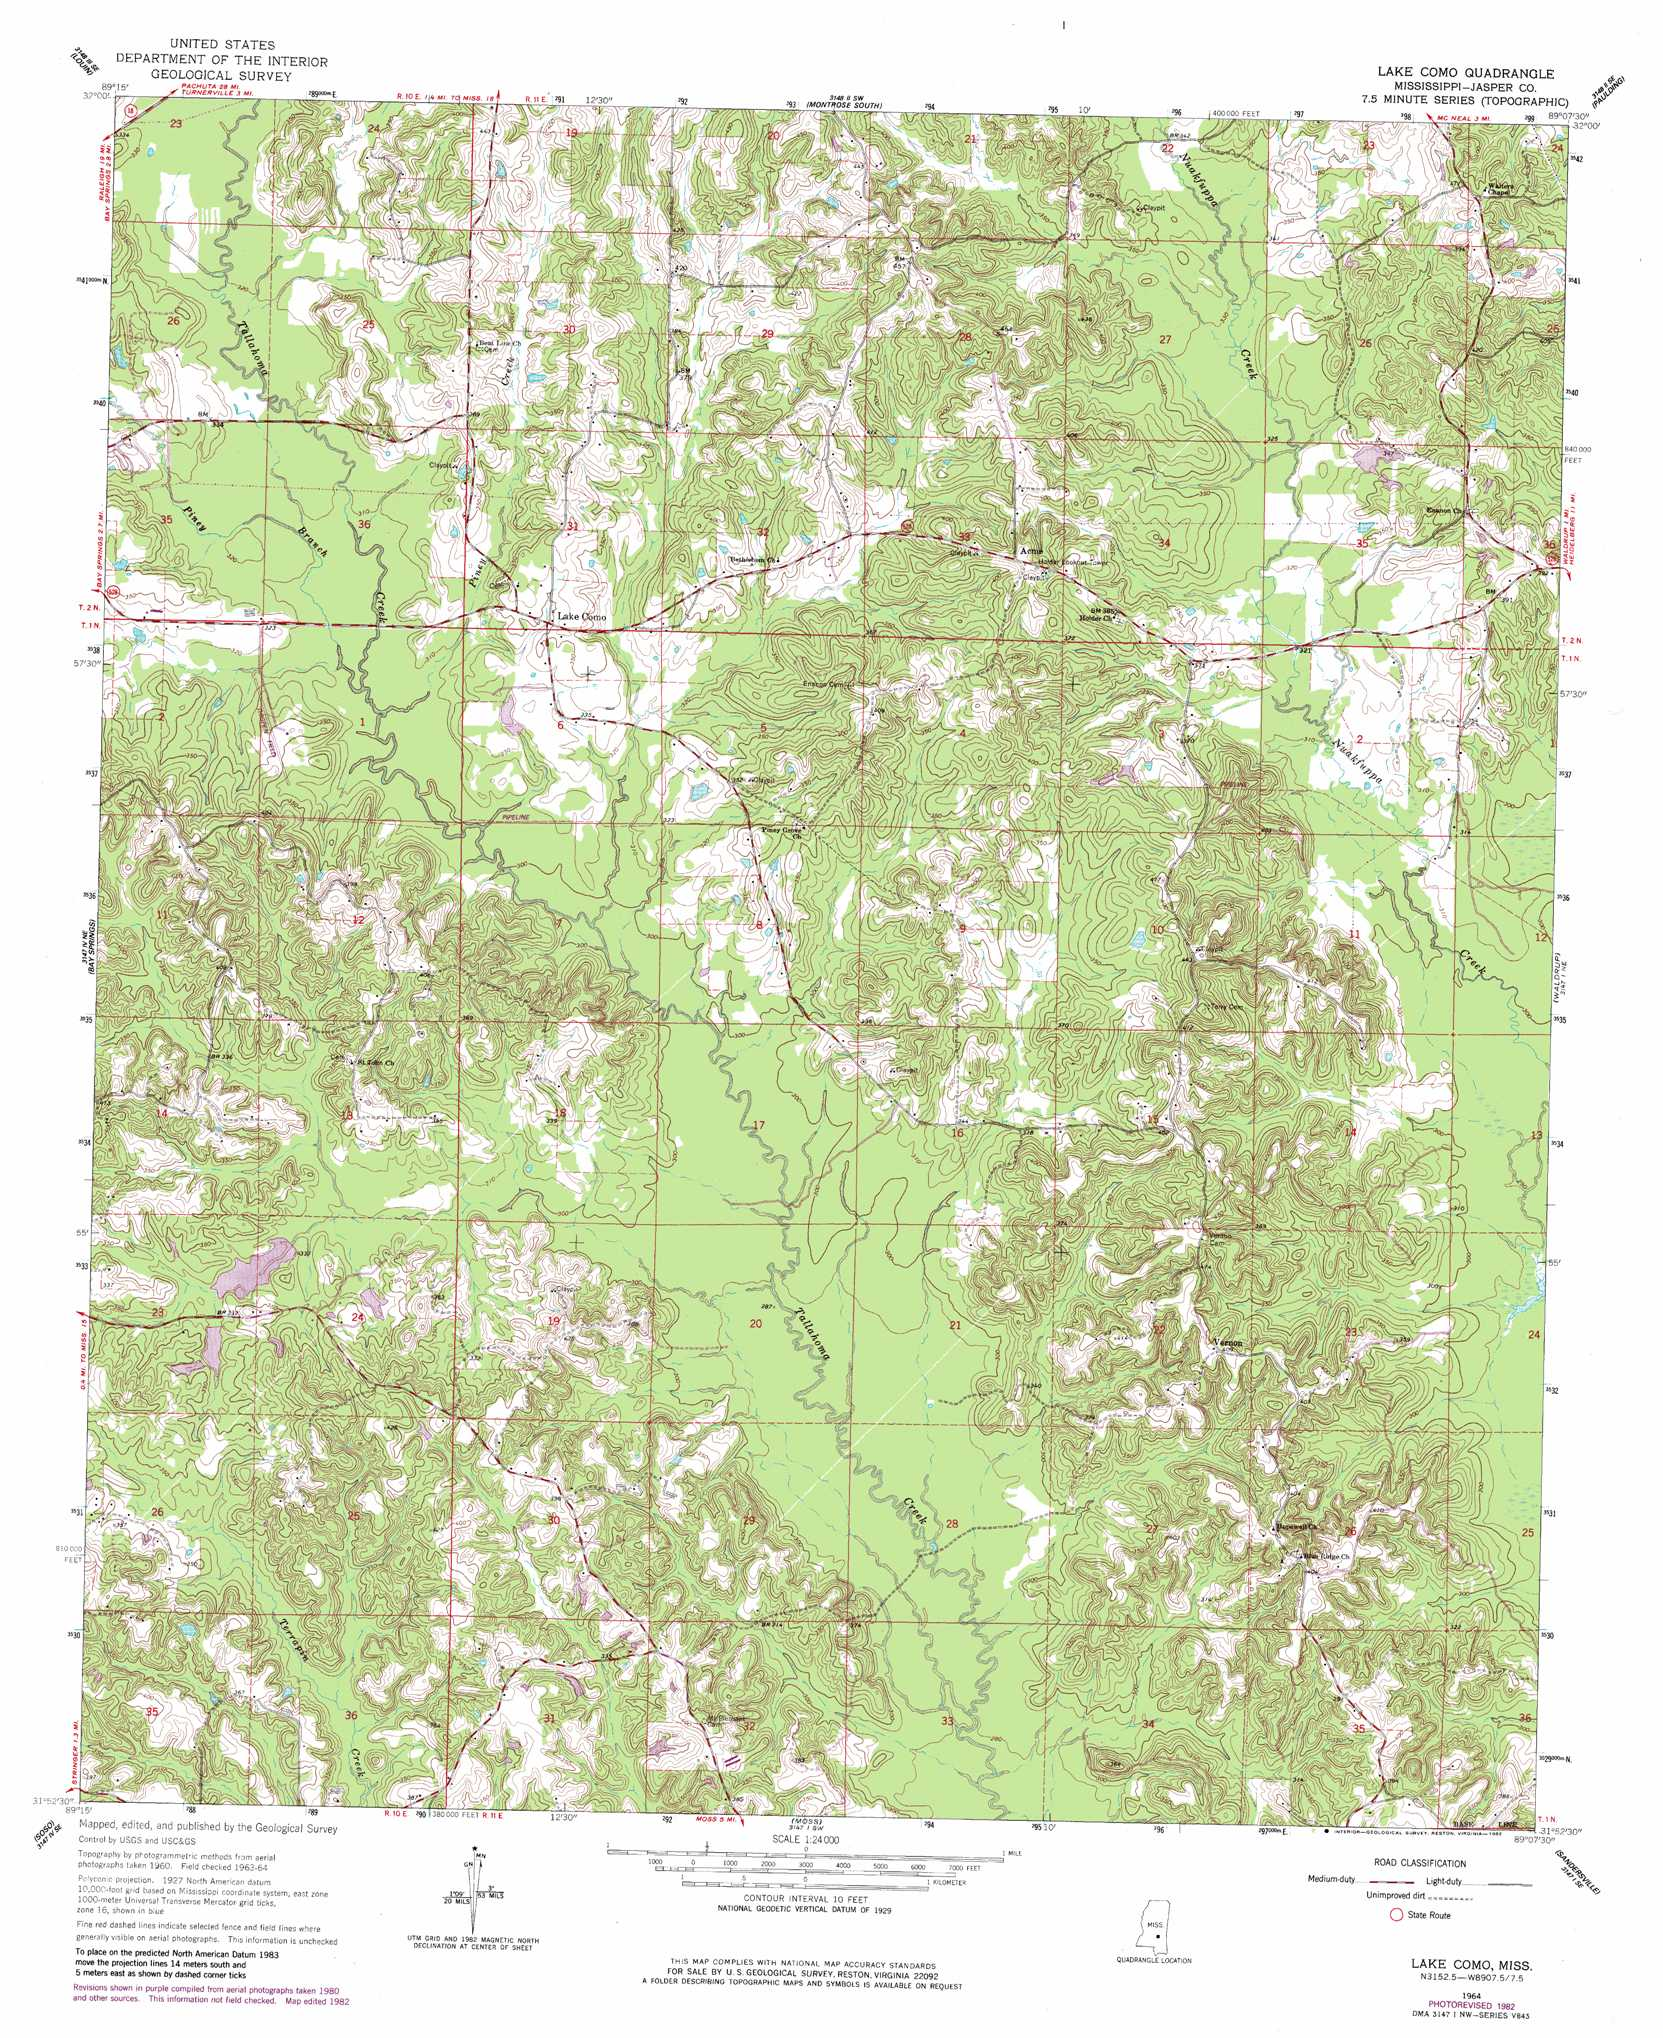 Topographic Map Mississippi.Lake Como Topographic Map Ms Usgs Topo Quad 31089h2